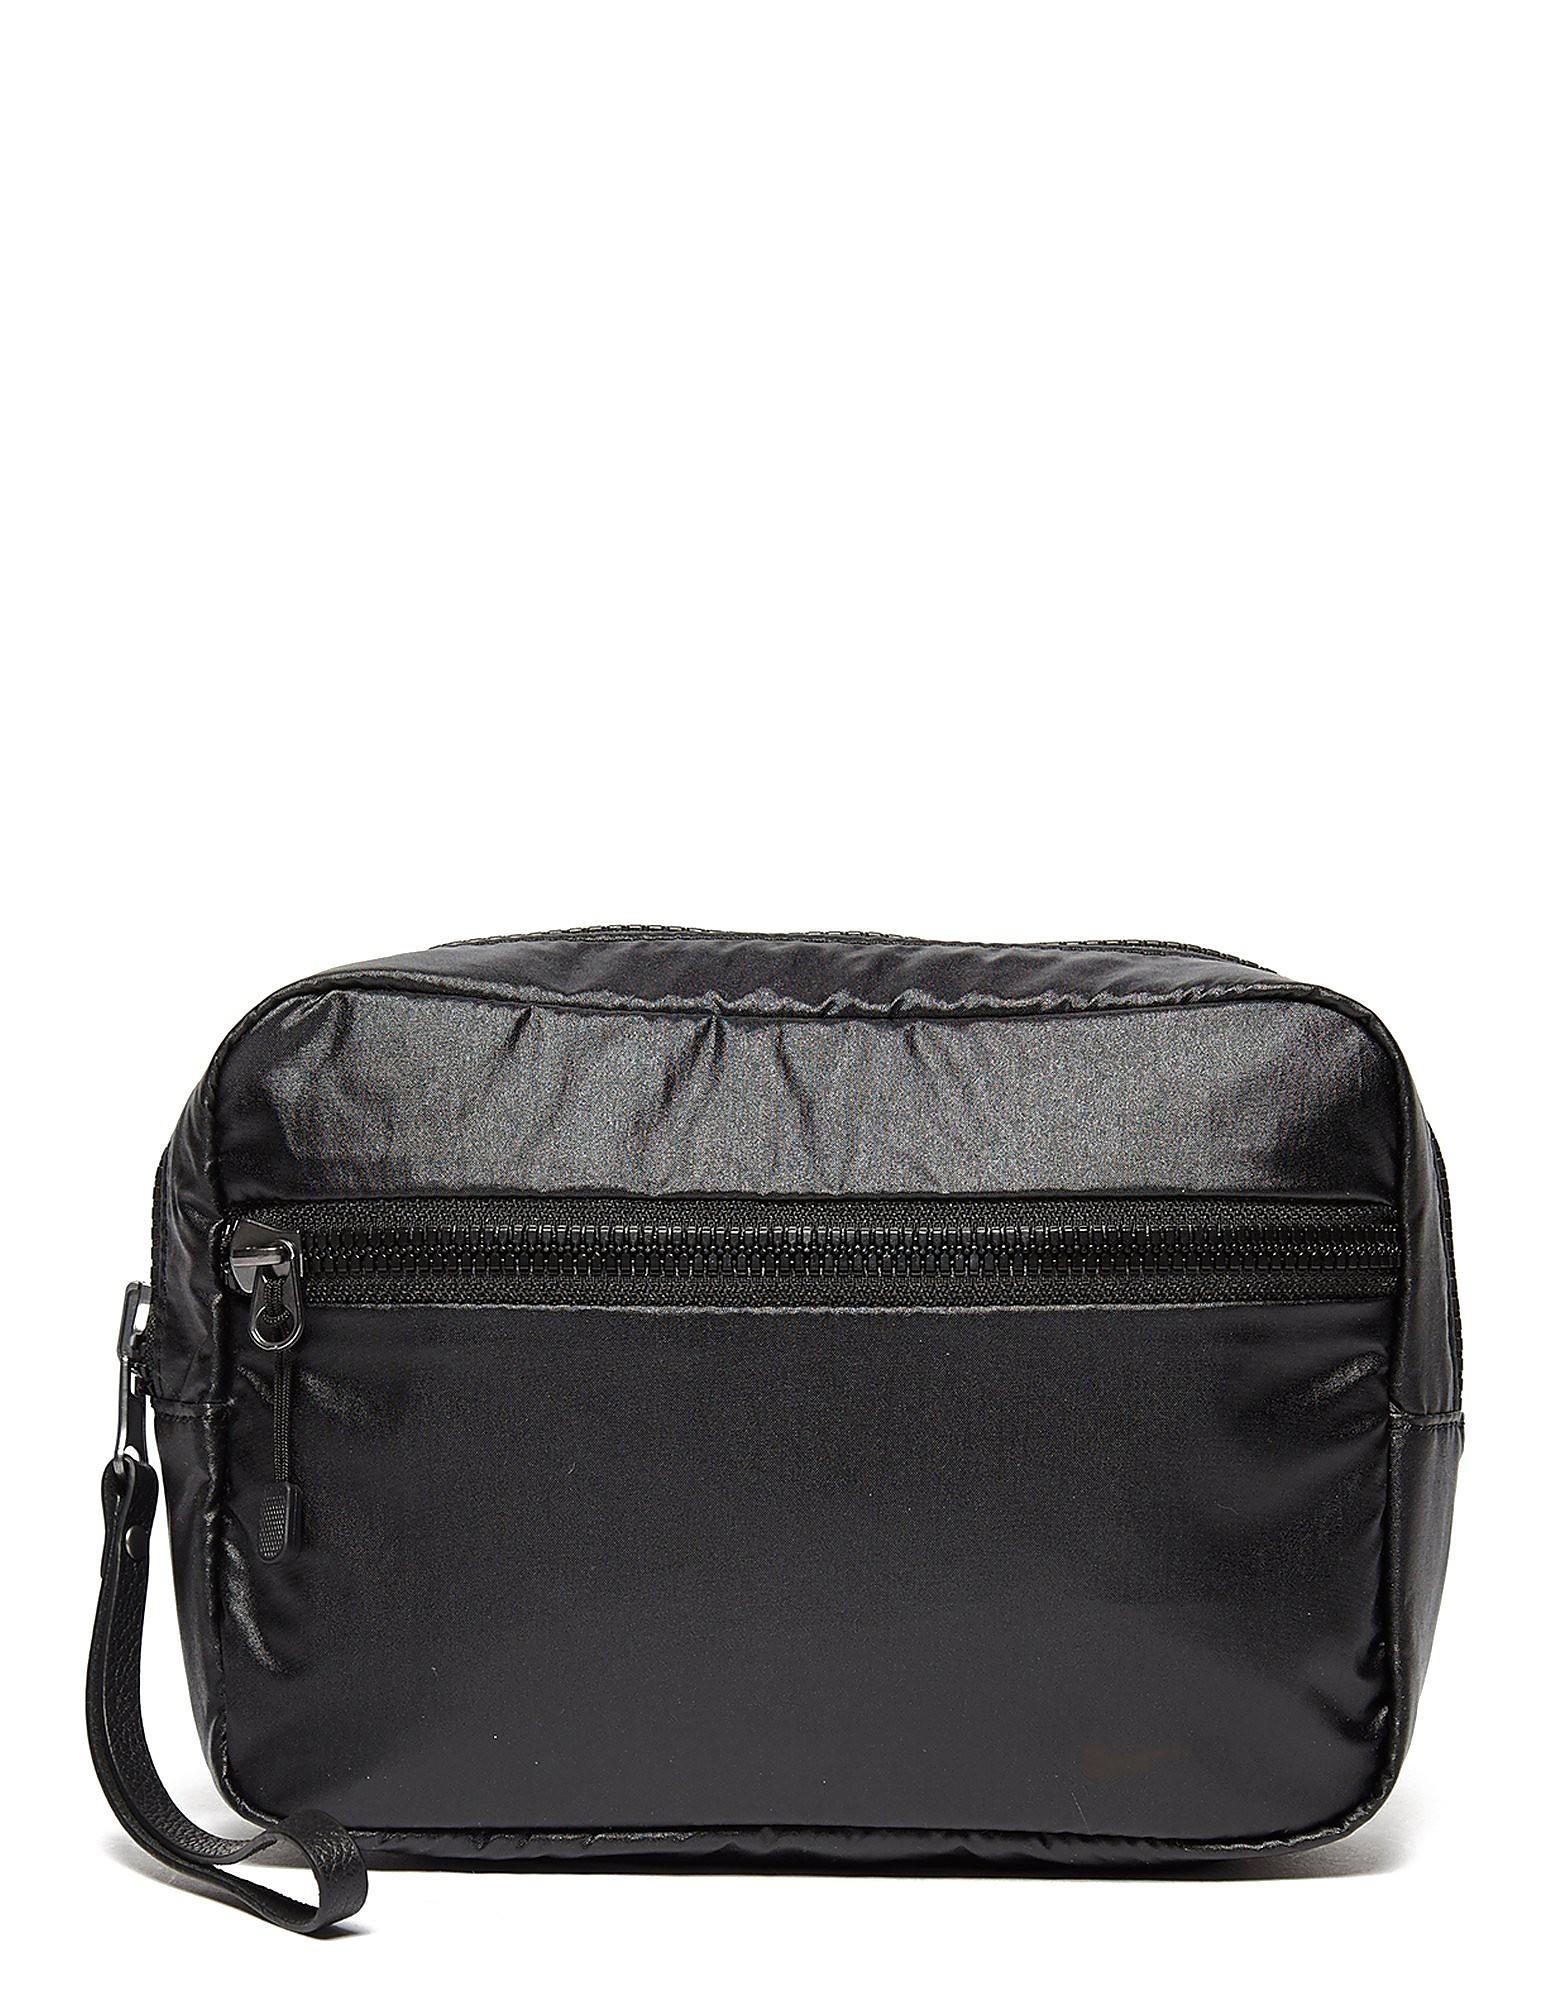 Nike Studio Kit Bag 2.0